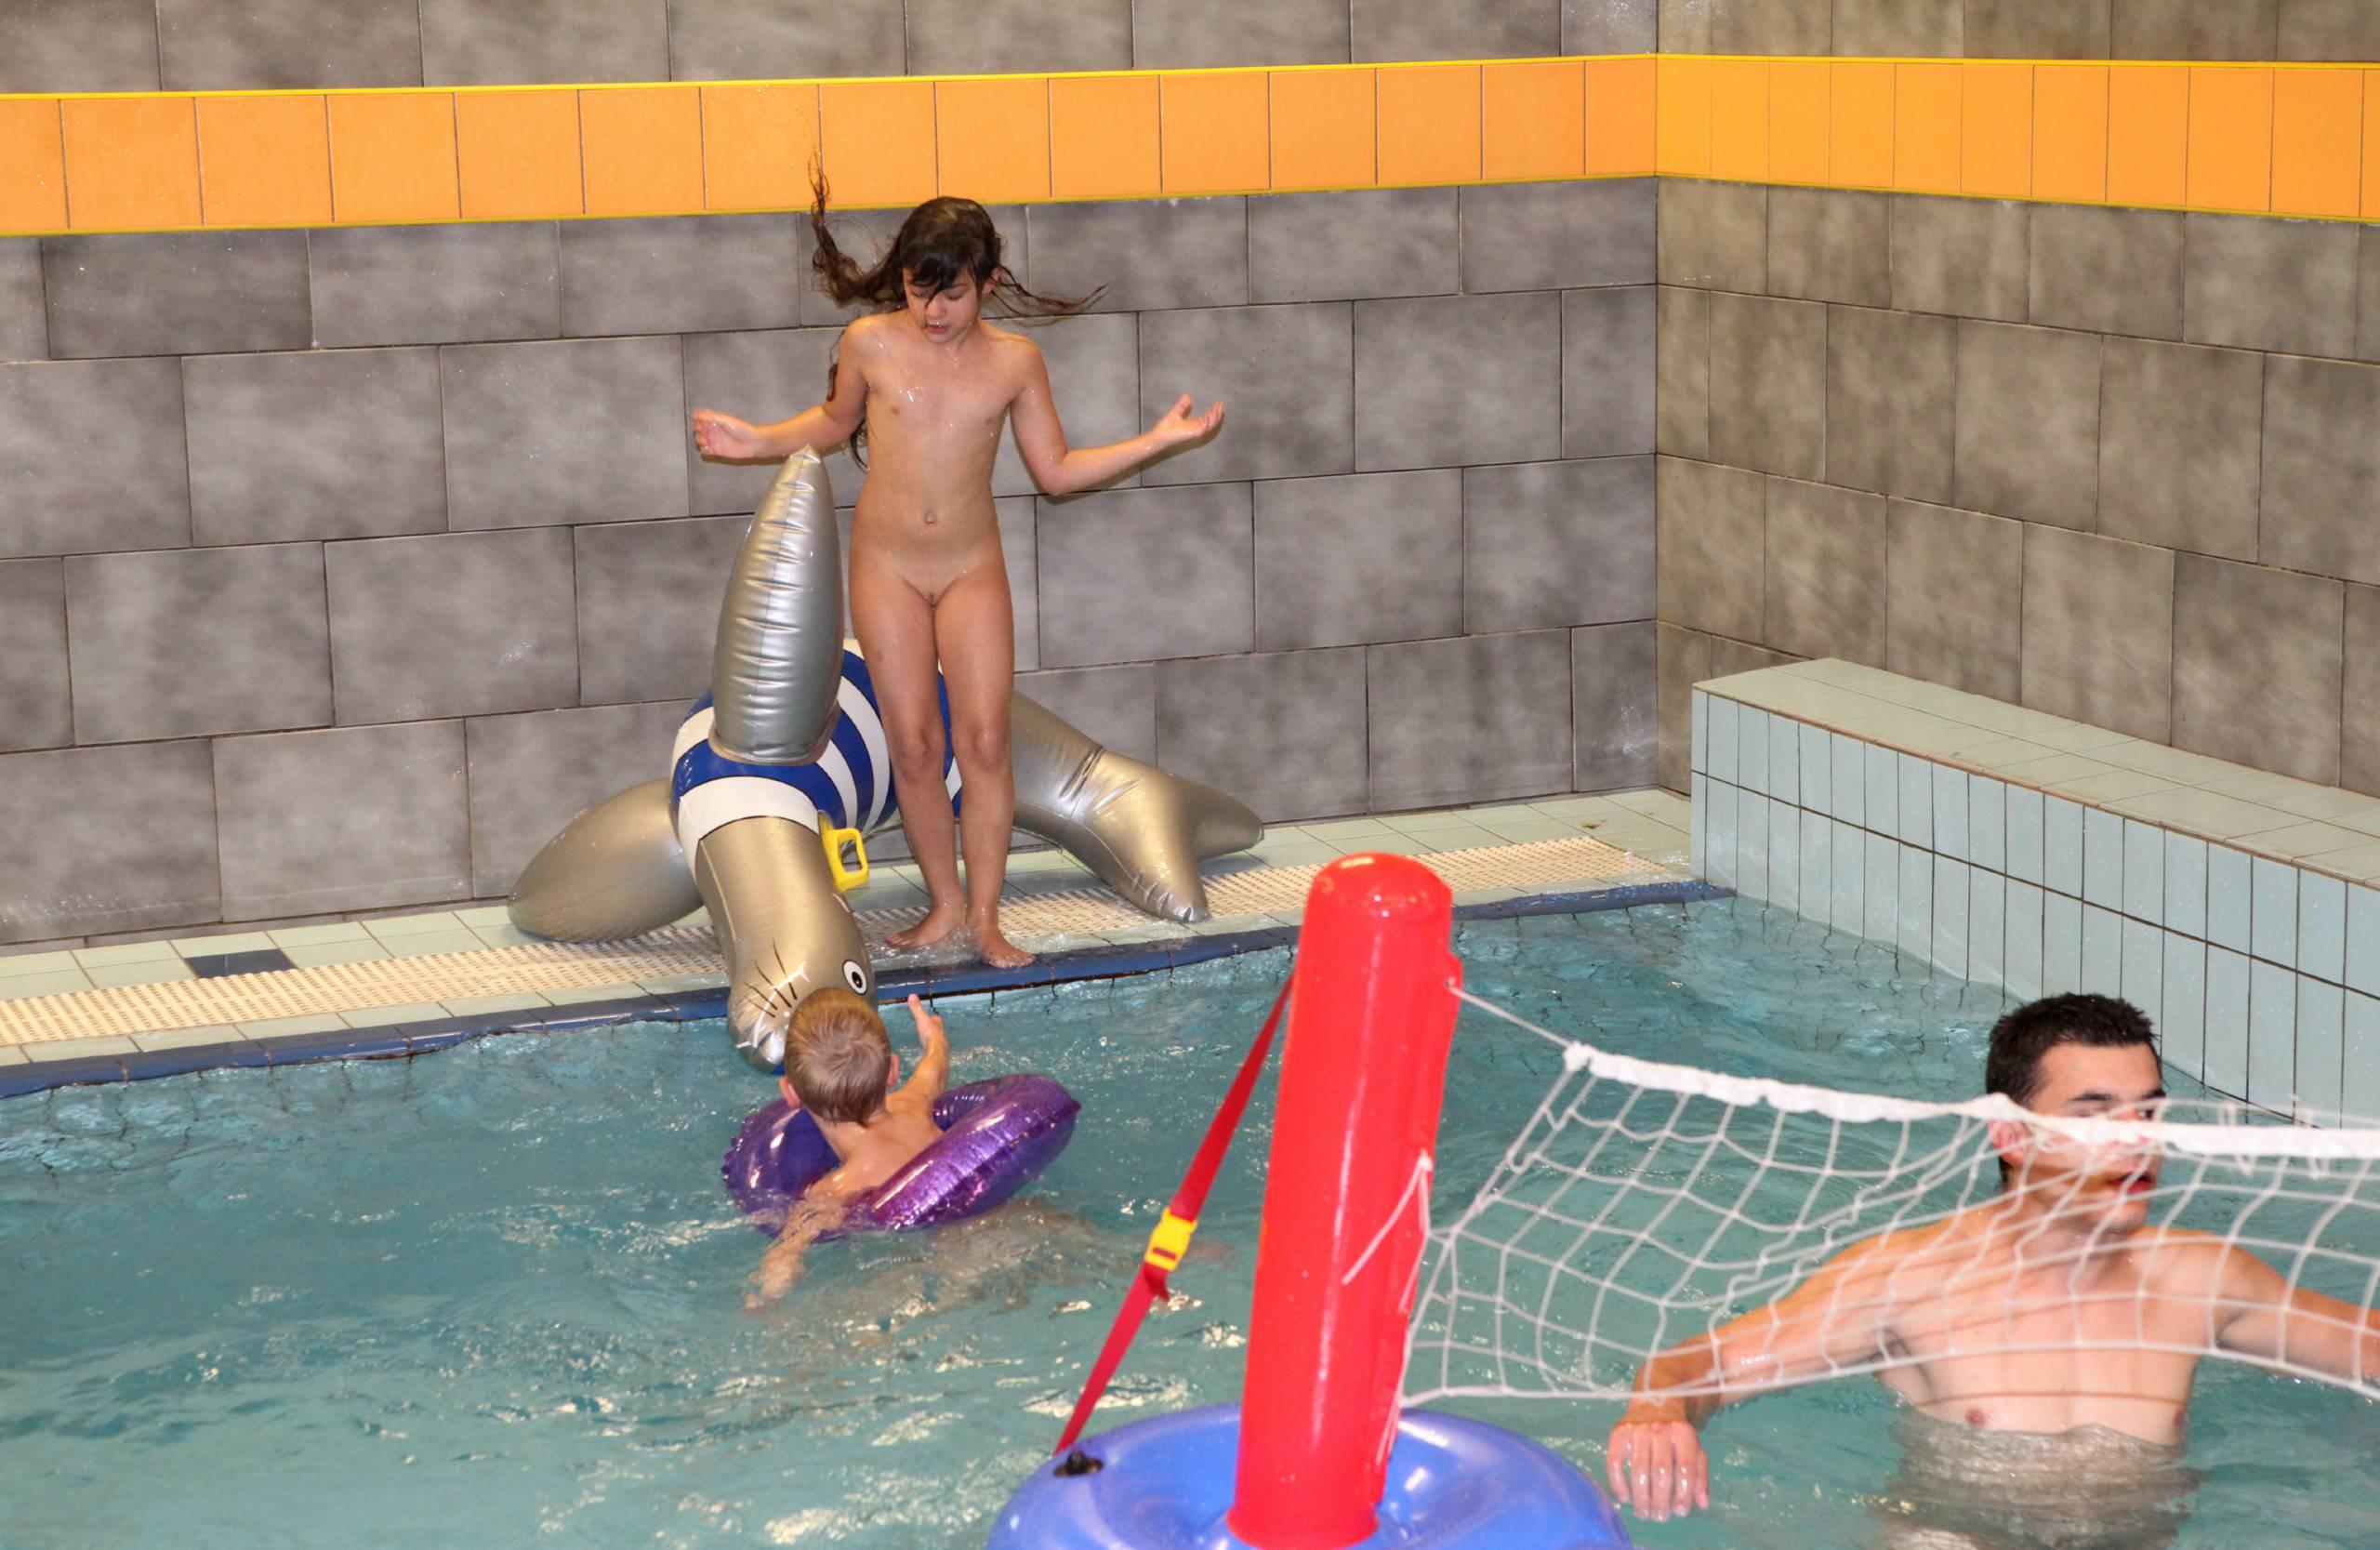 Nudist Photos Indoor Swimming Pool - 1